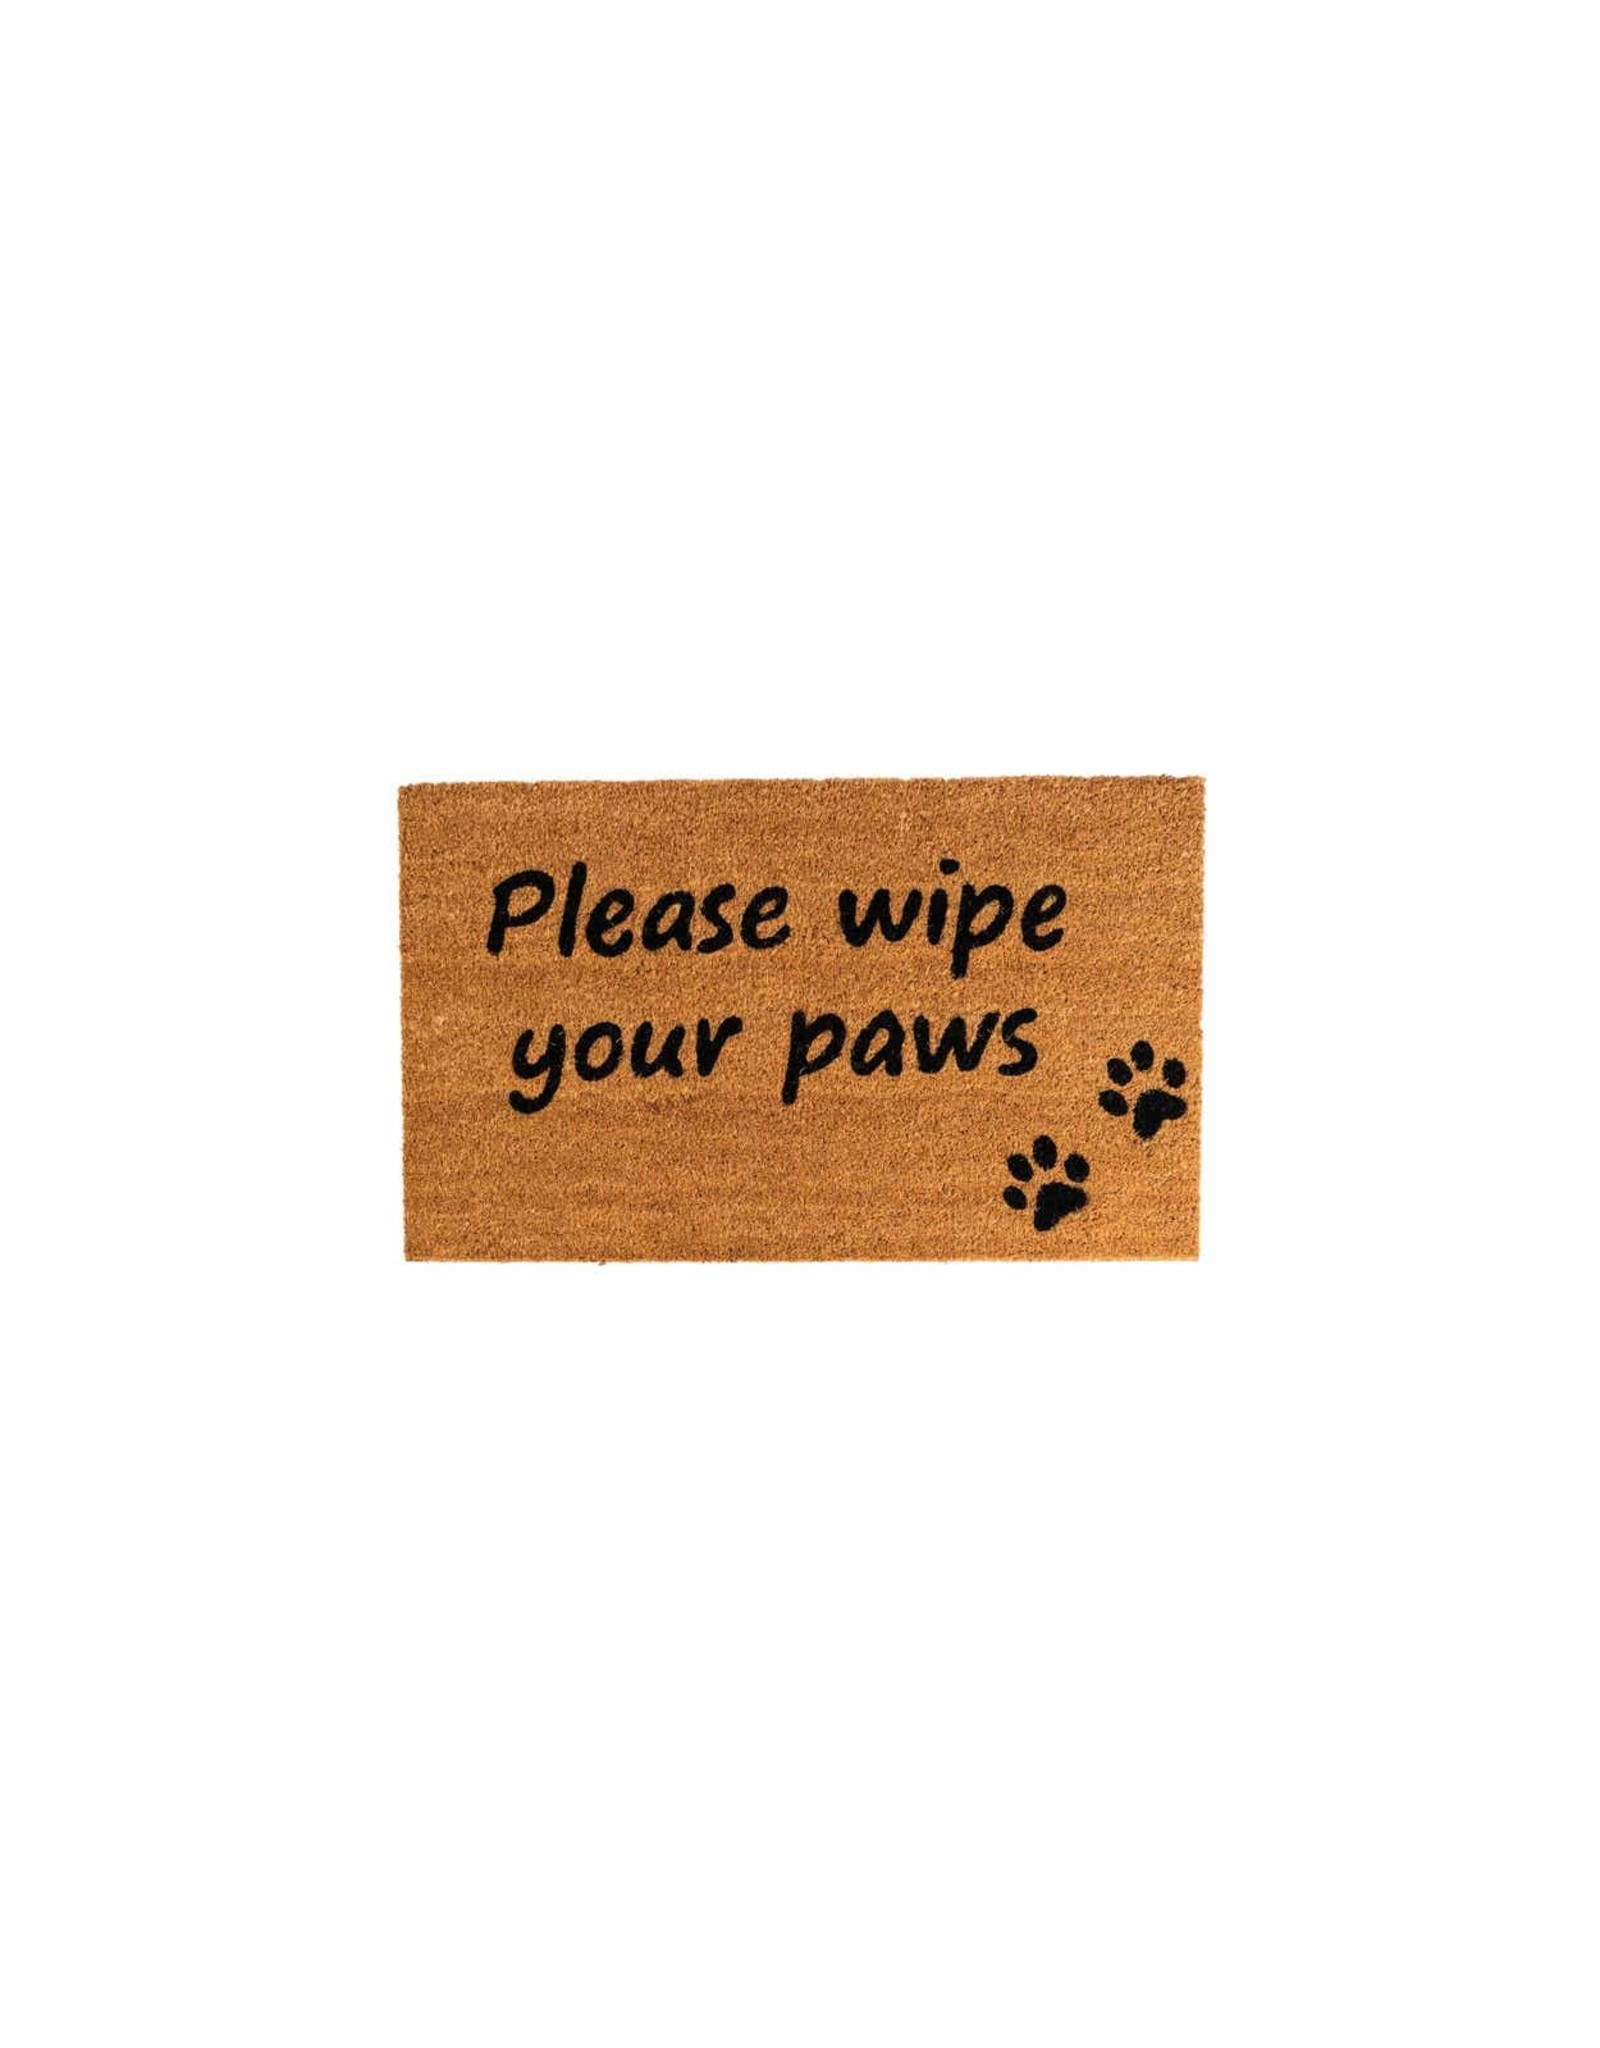 Wipe your Paws Doormat, India